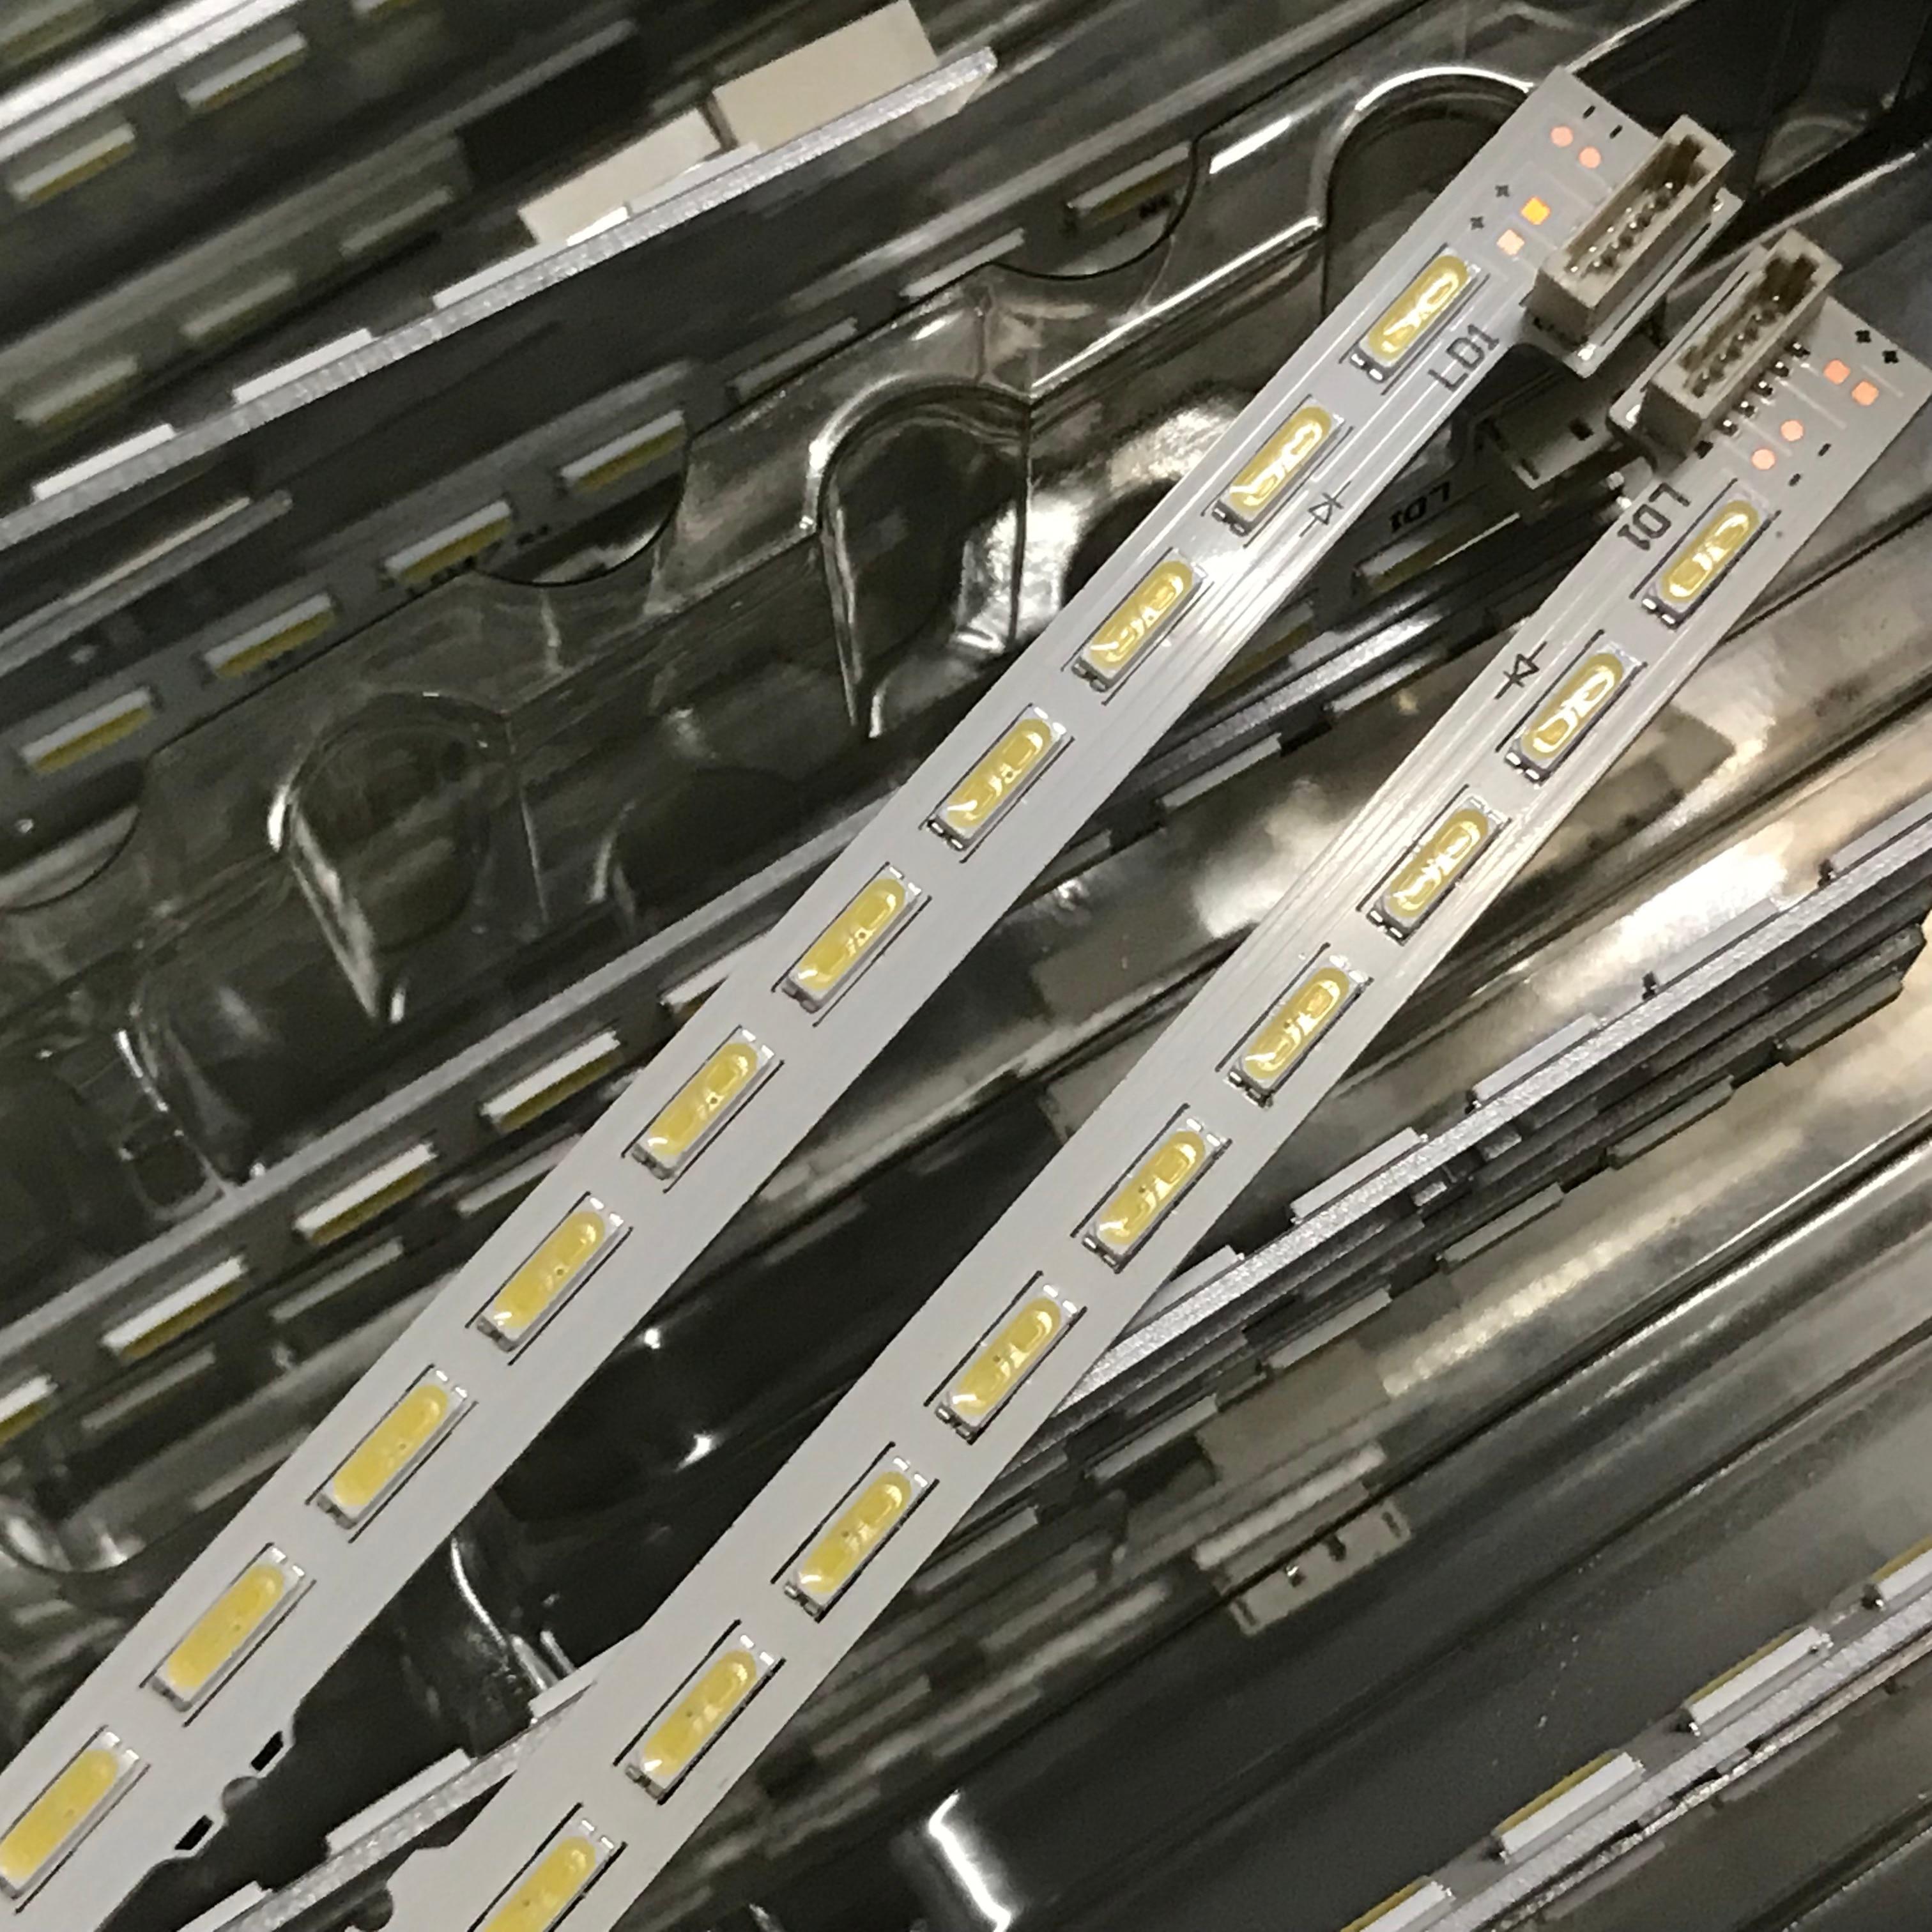 1 Conjunto = 2 uds para LG retroiluminación LED de KDL-47W805A KDL-47W802A Kdl-47W809 KDL-47W807A LC470EUF F LC470EUF-FFP2 LC470EUF-(FF) (P2)